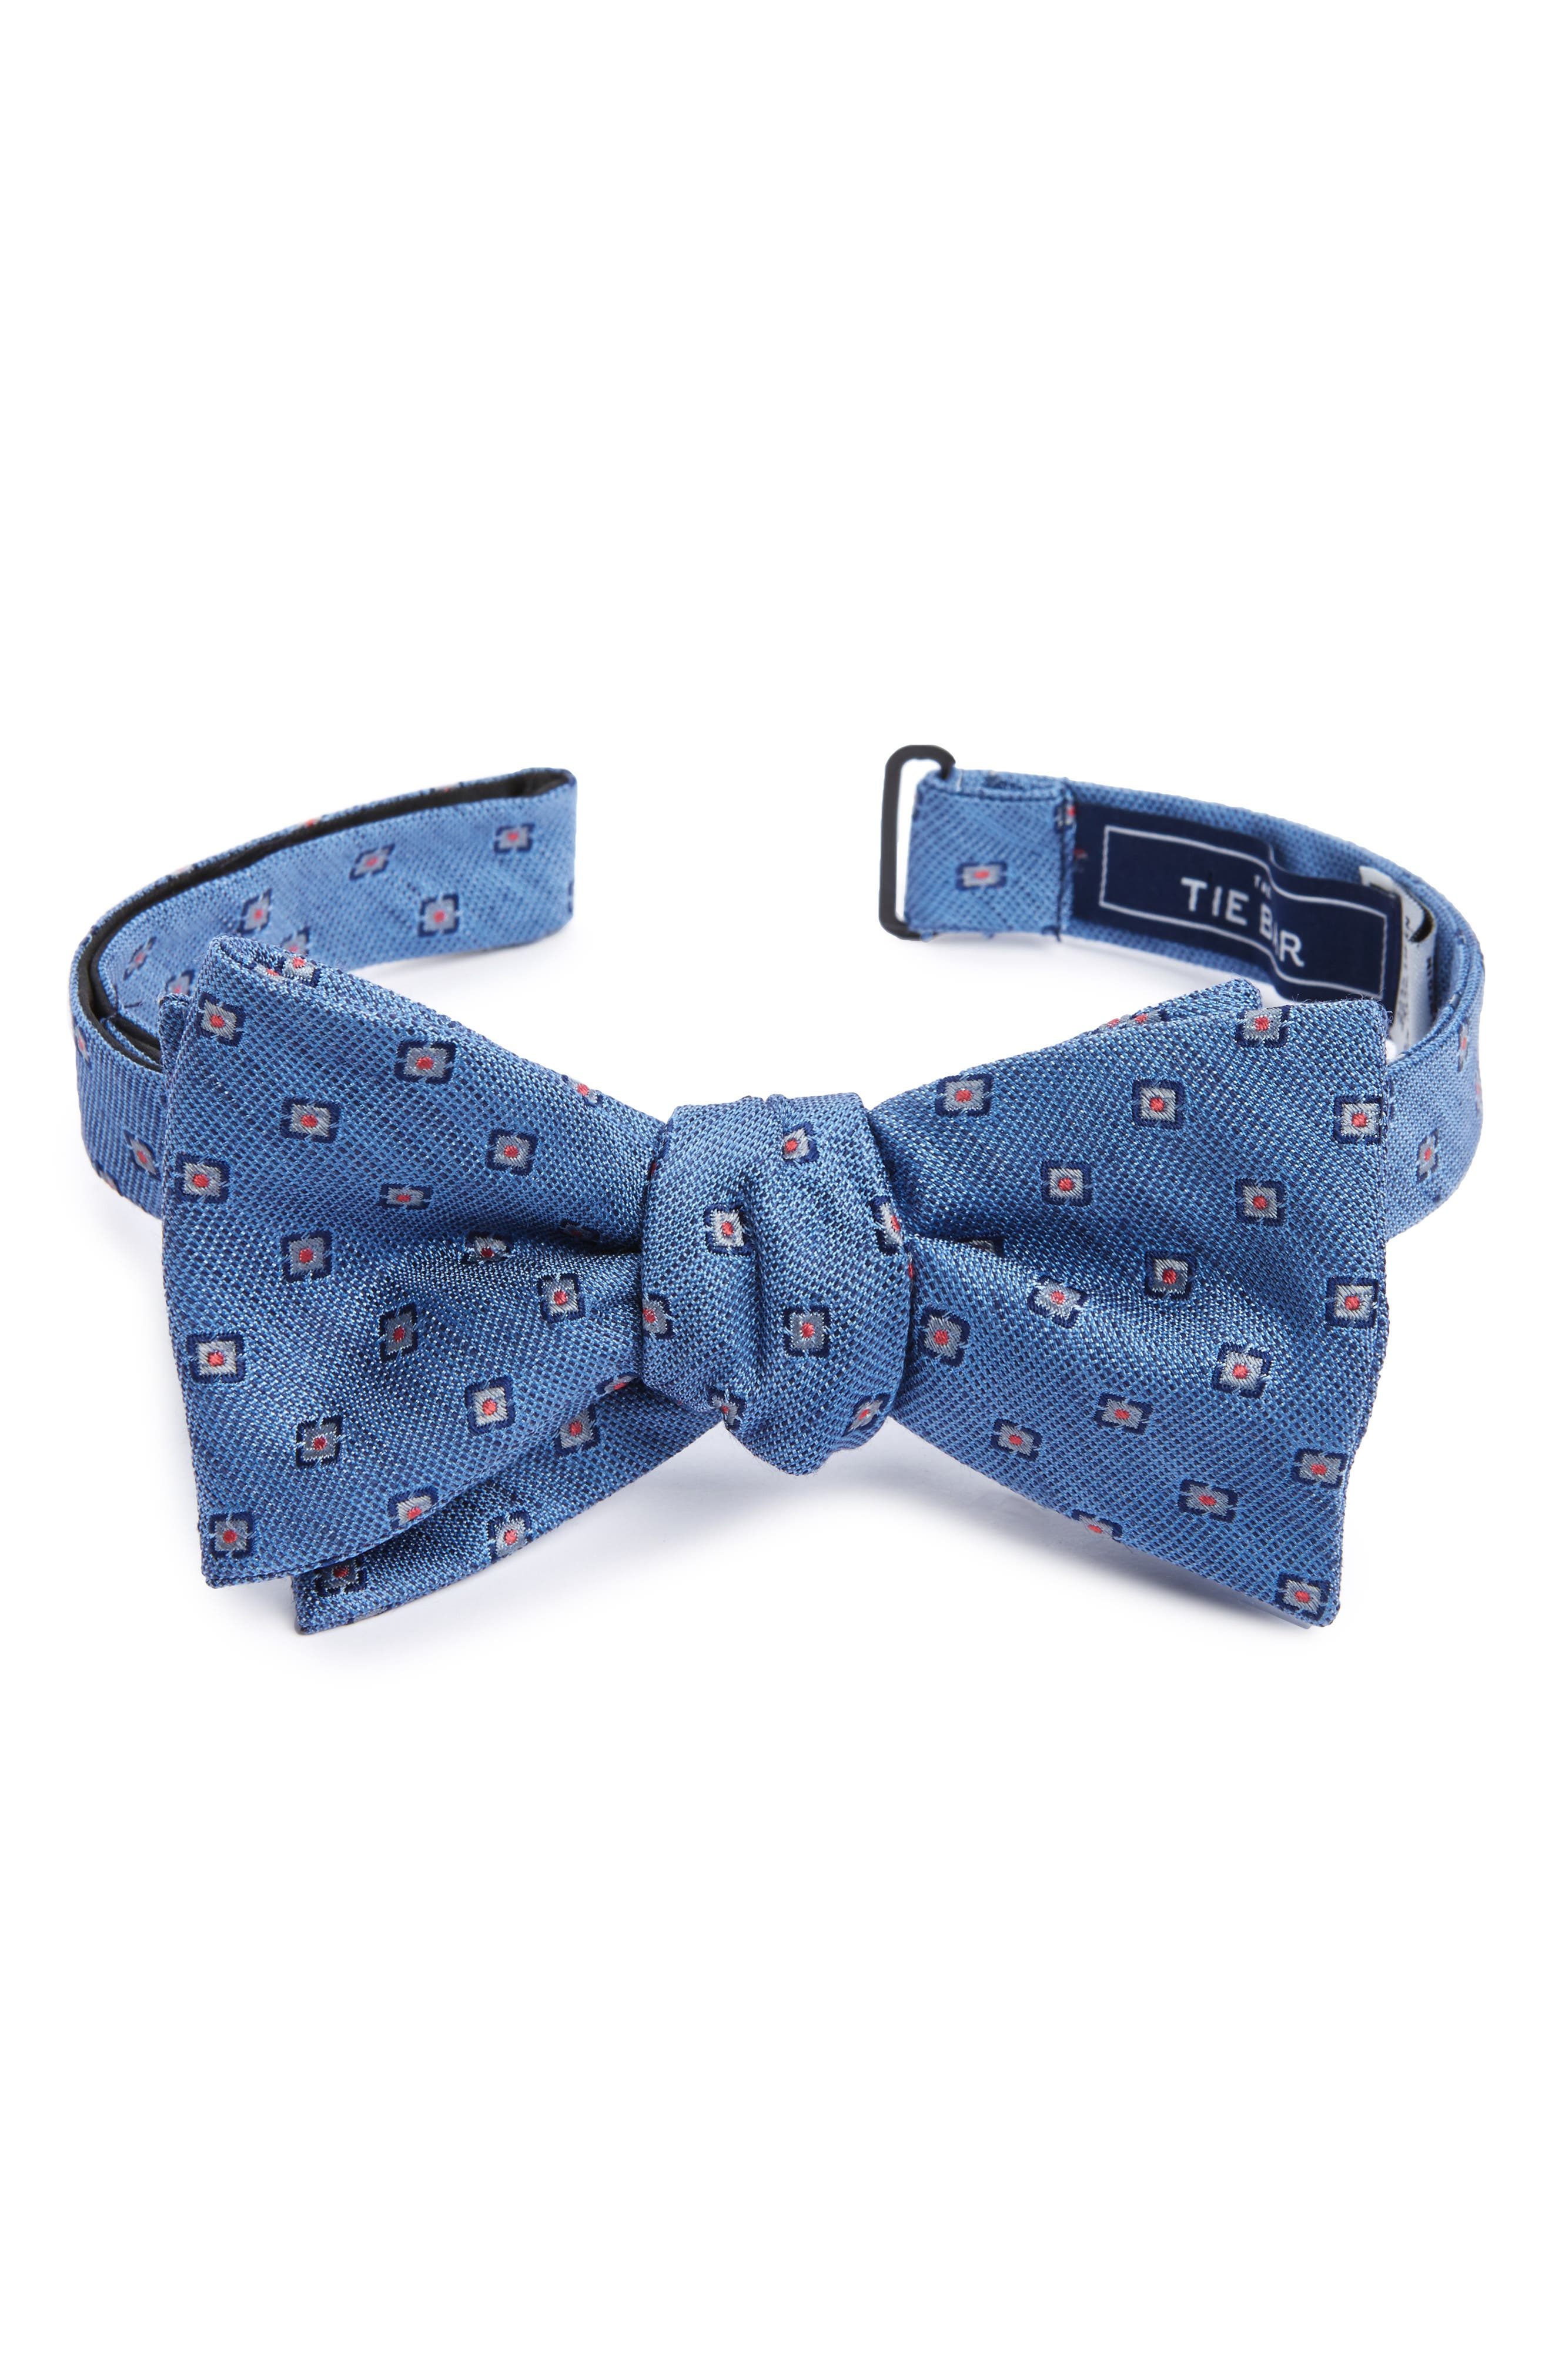 The Tie Bar Medallion Scene Silk & Linen Bow Tie